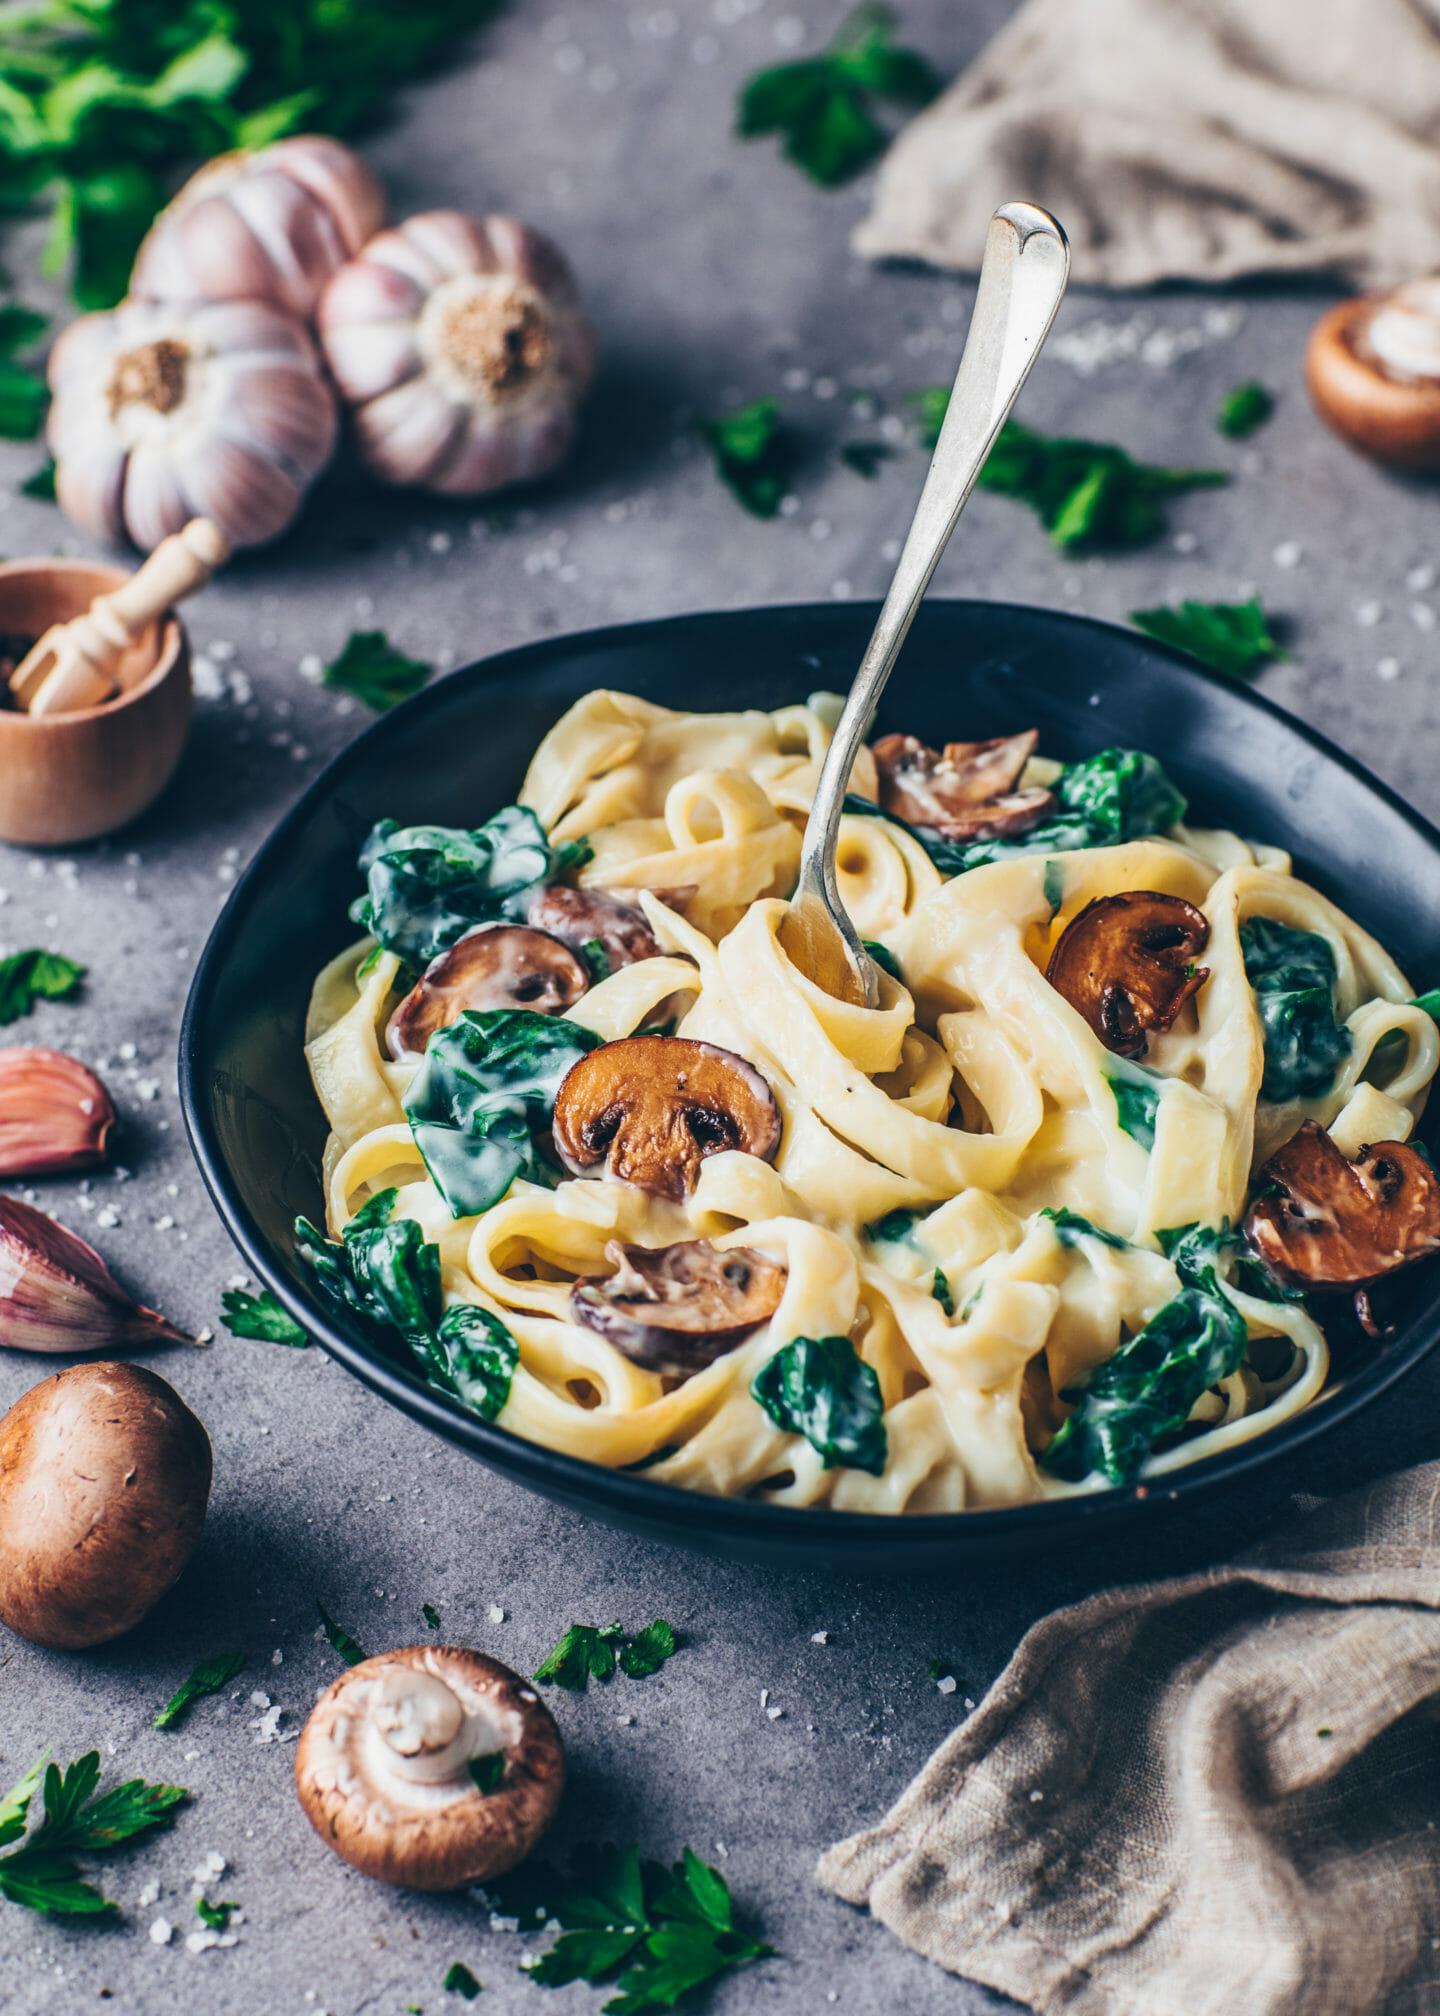 Vegan Alfredo Pasta with Cauliflower Sauce, mushrooms and spinach